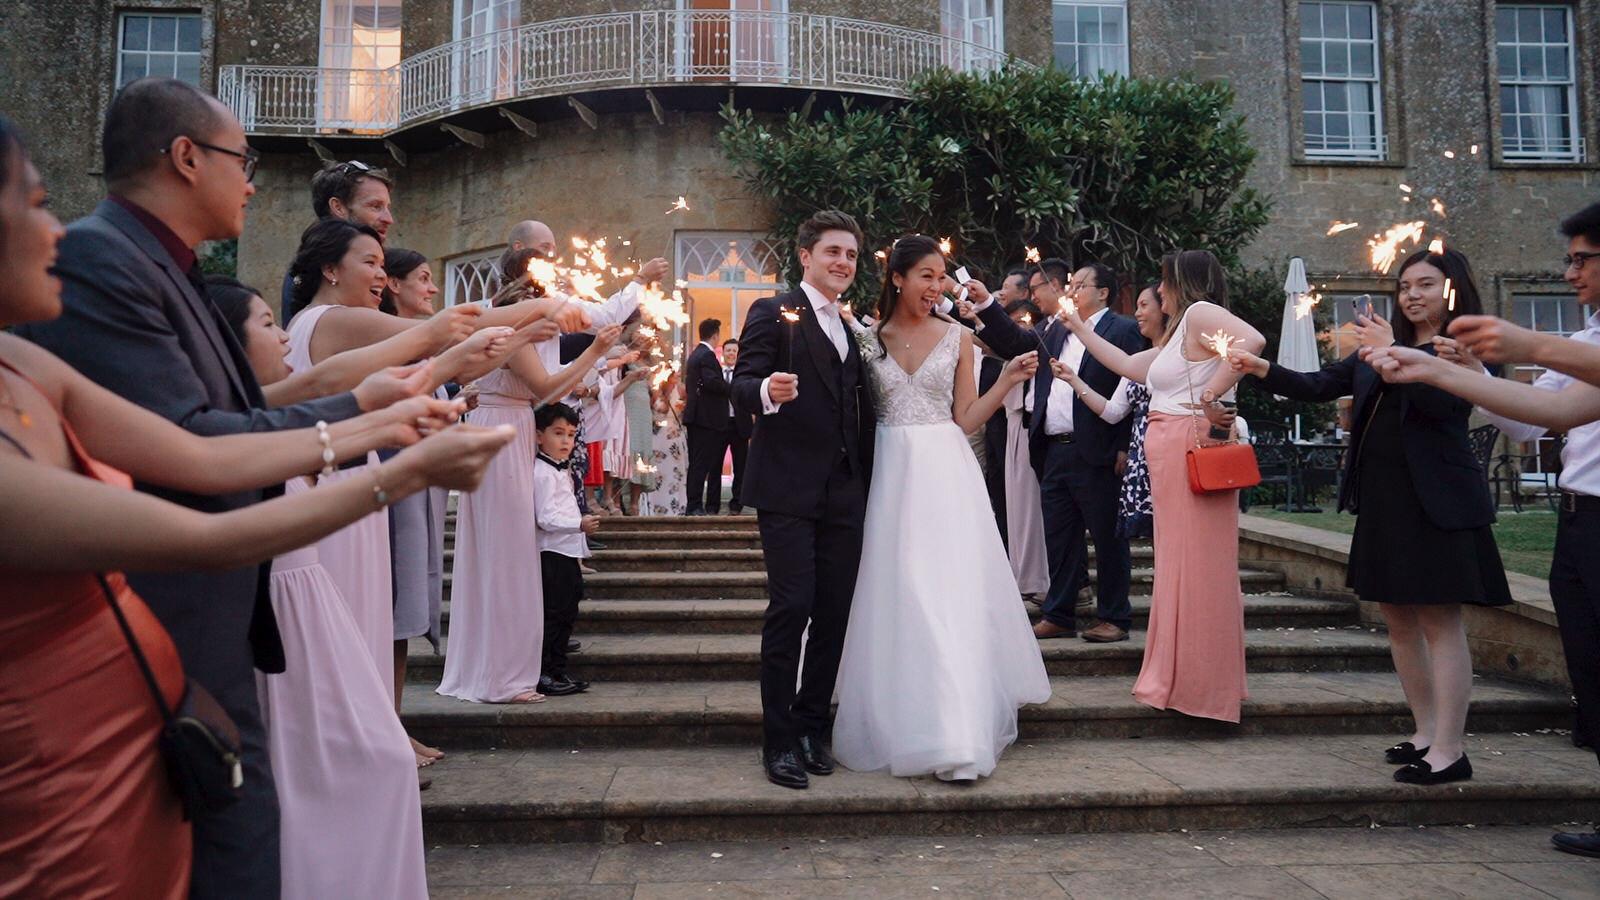 North Cadbury Court Wedding Film